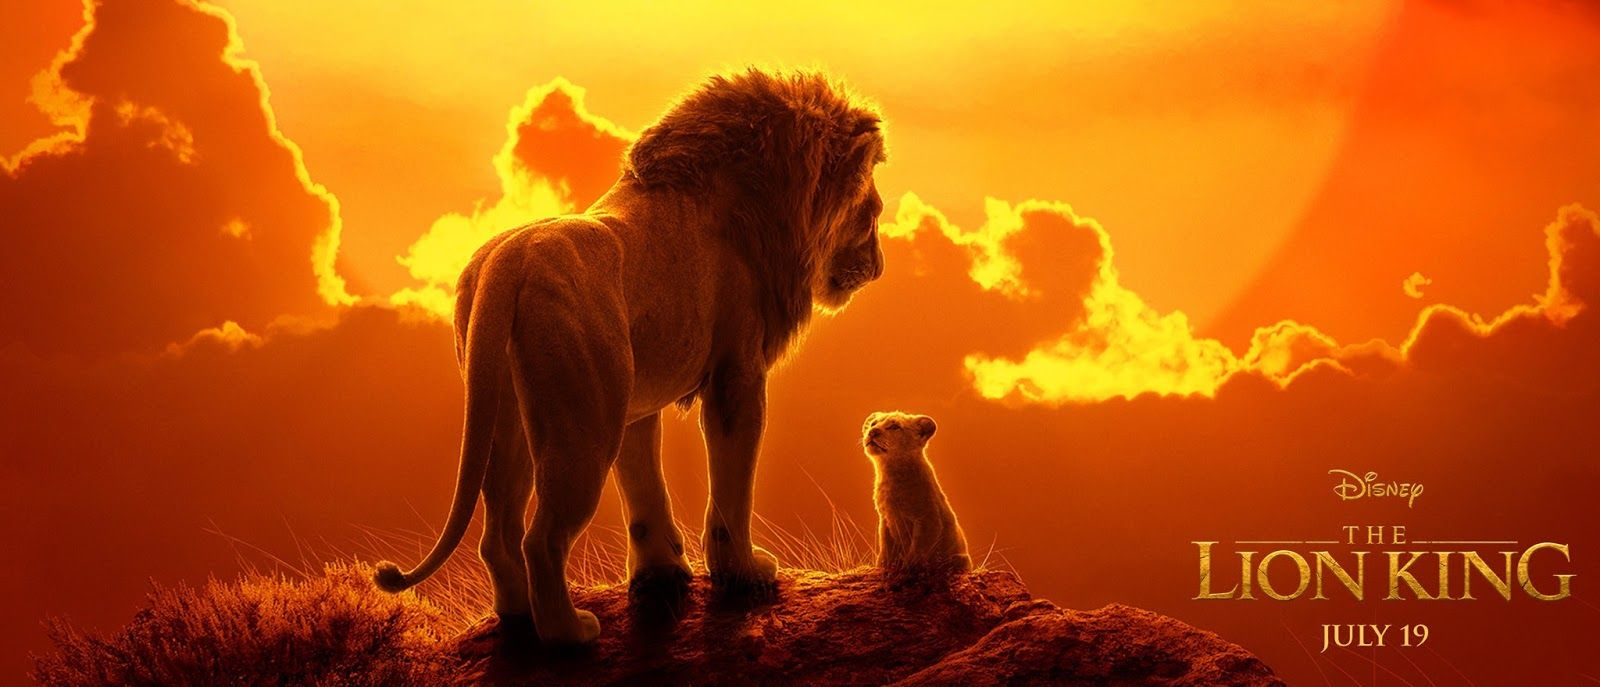 Pin by Tabitha Short on Disney! Lion king movie, Lion